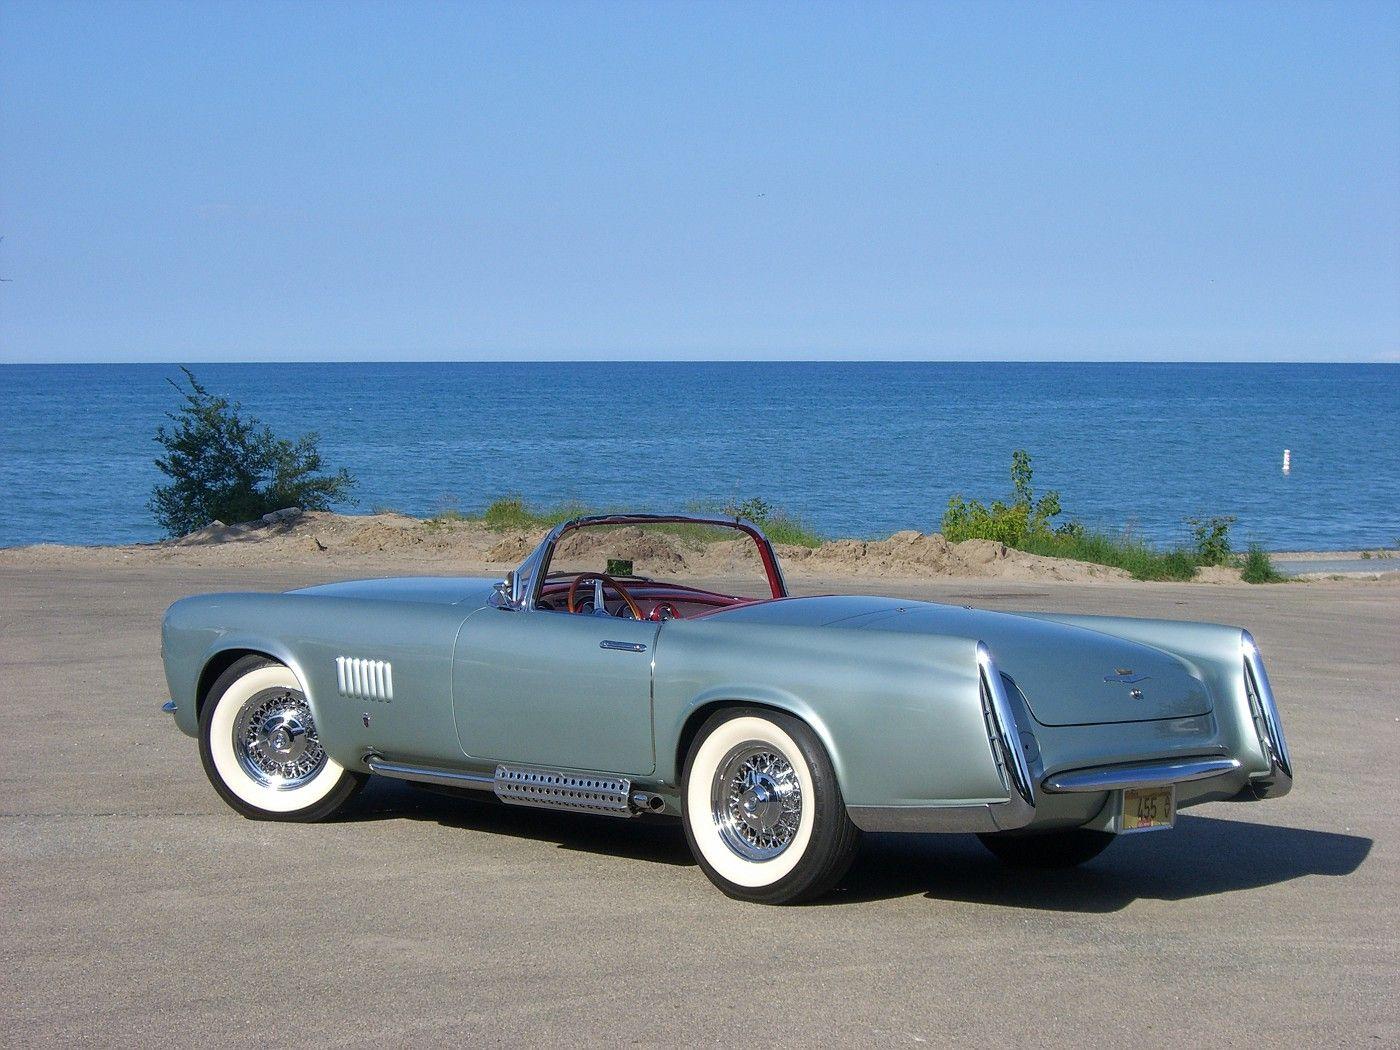 1955 Chrysler Ghia Falcon Concept | CLASSIC Cars | Pinterest ...